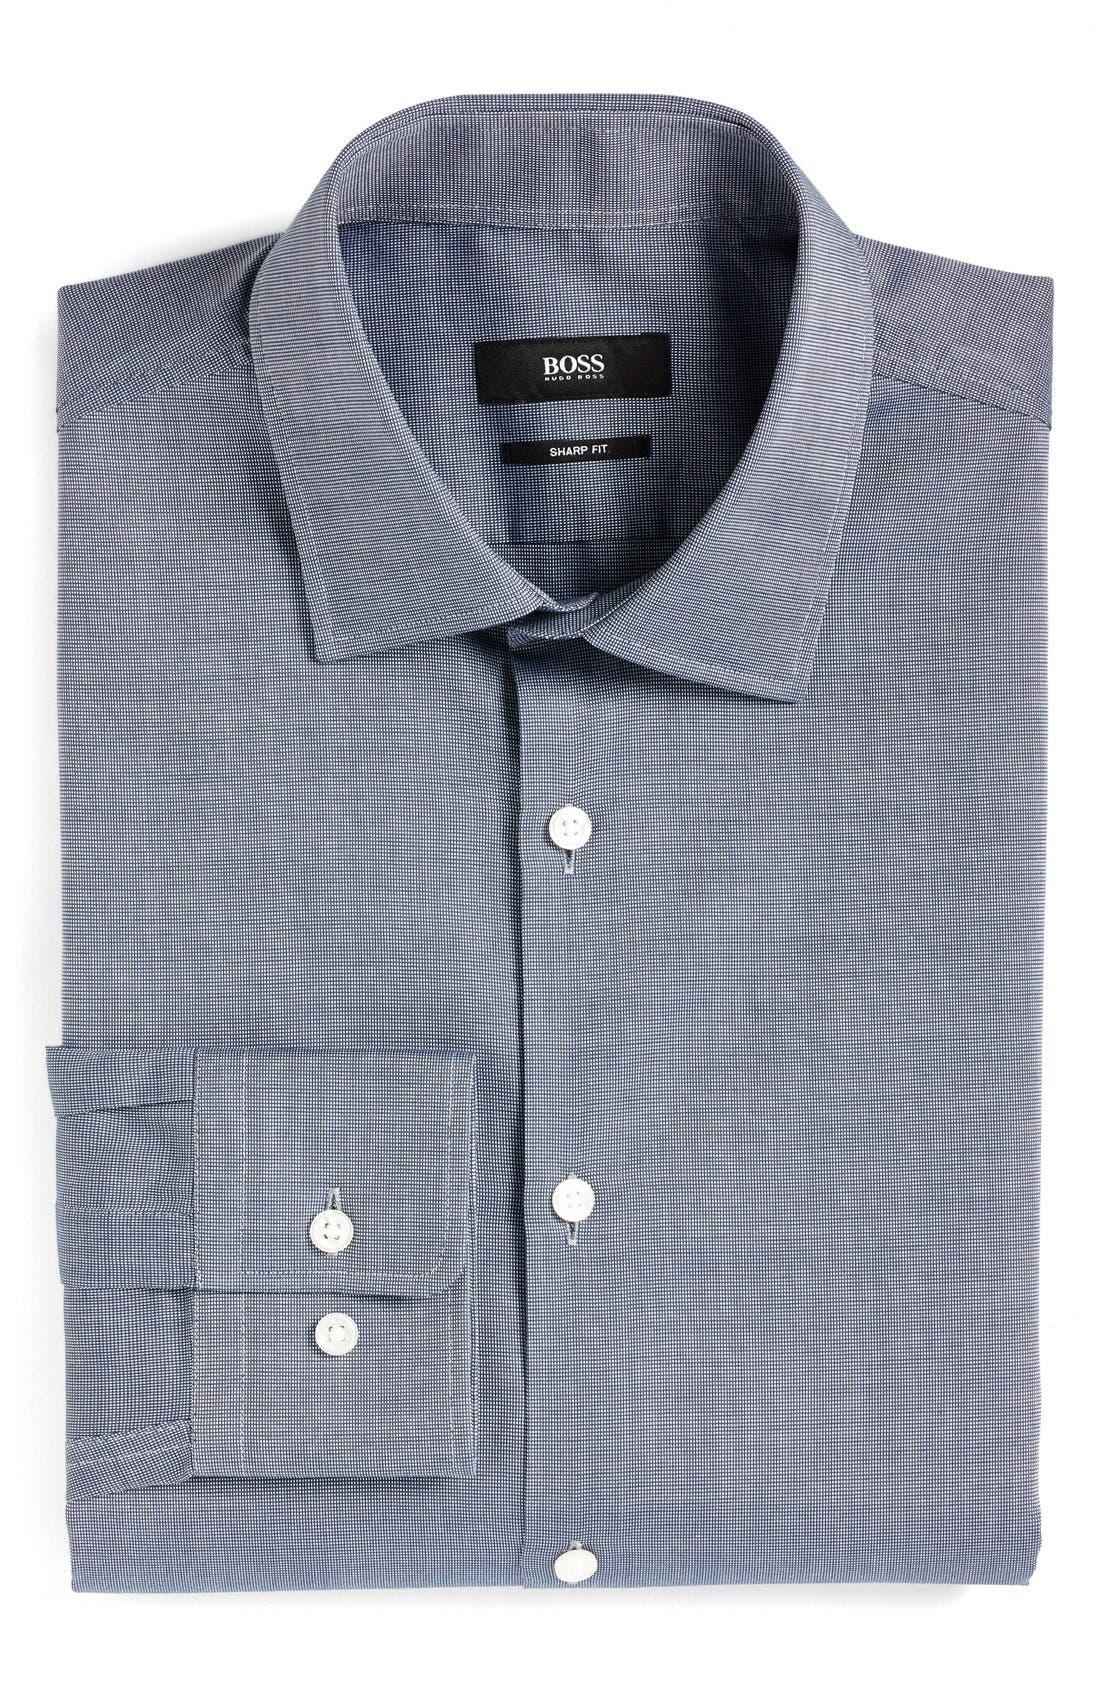 Alternate Image 1 Selected - BOSS Sharp Fit Solid Dress Shirt